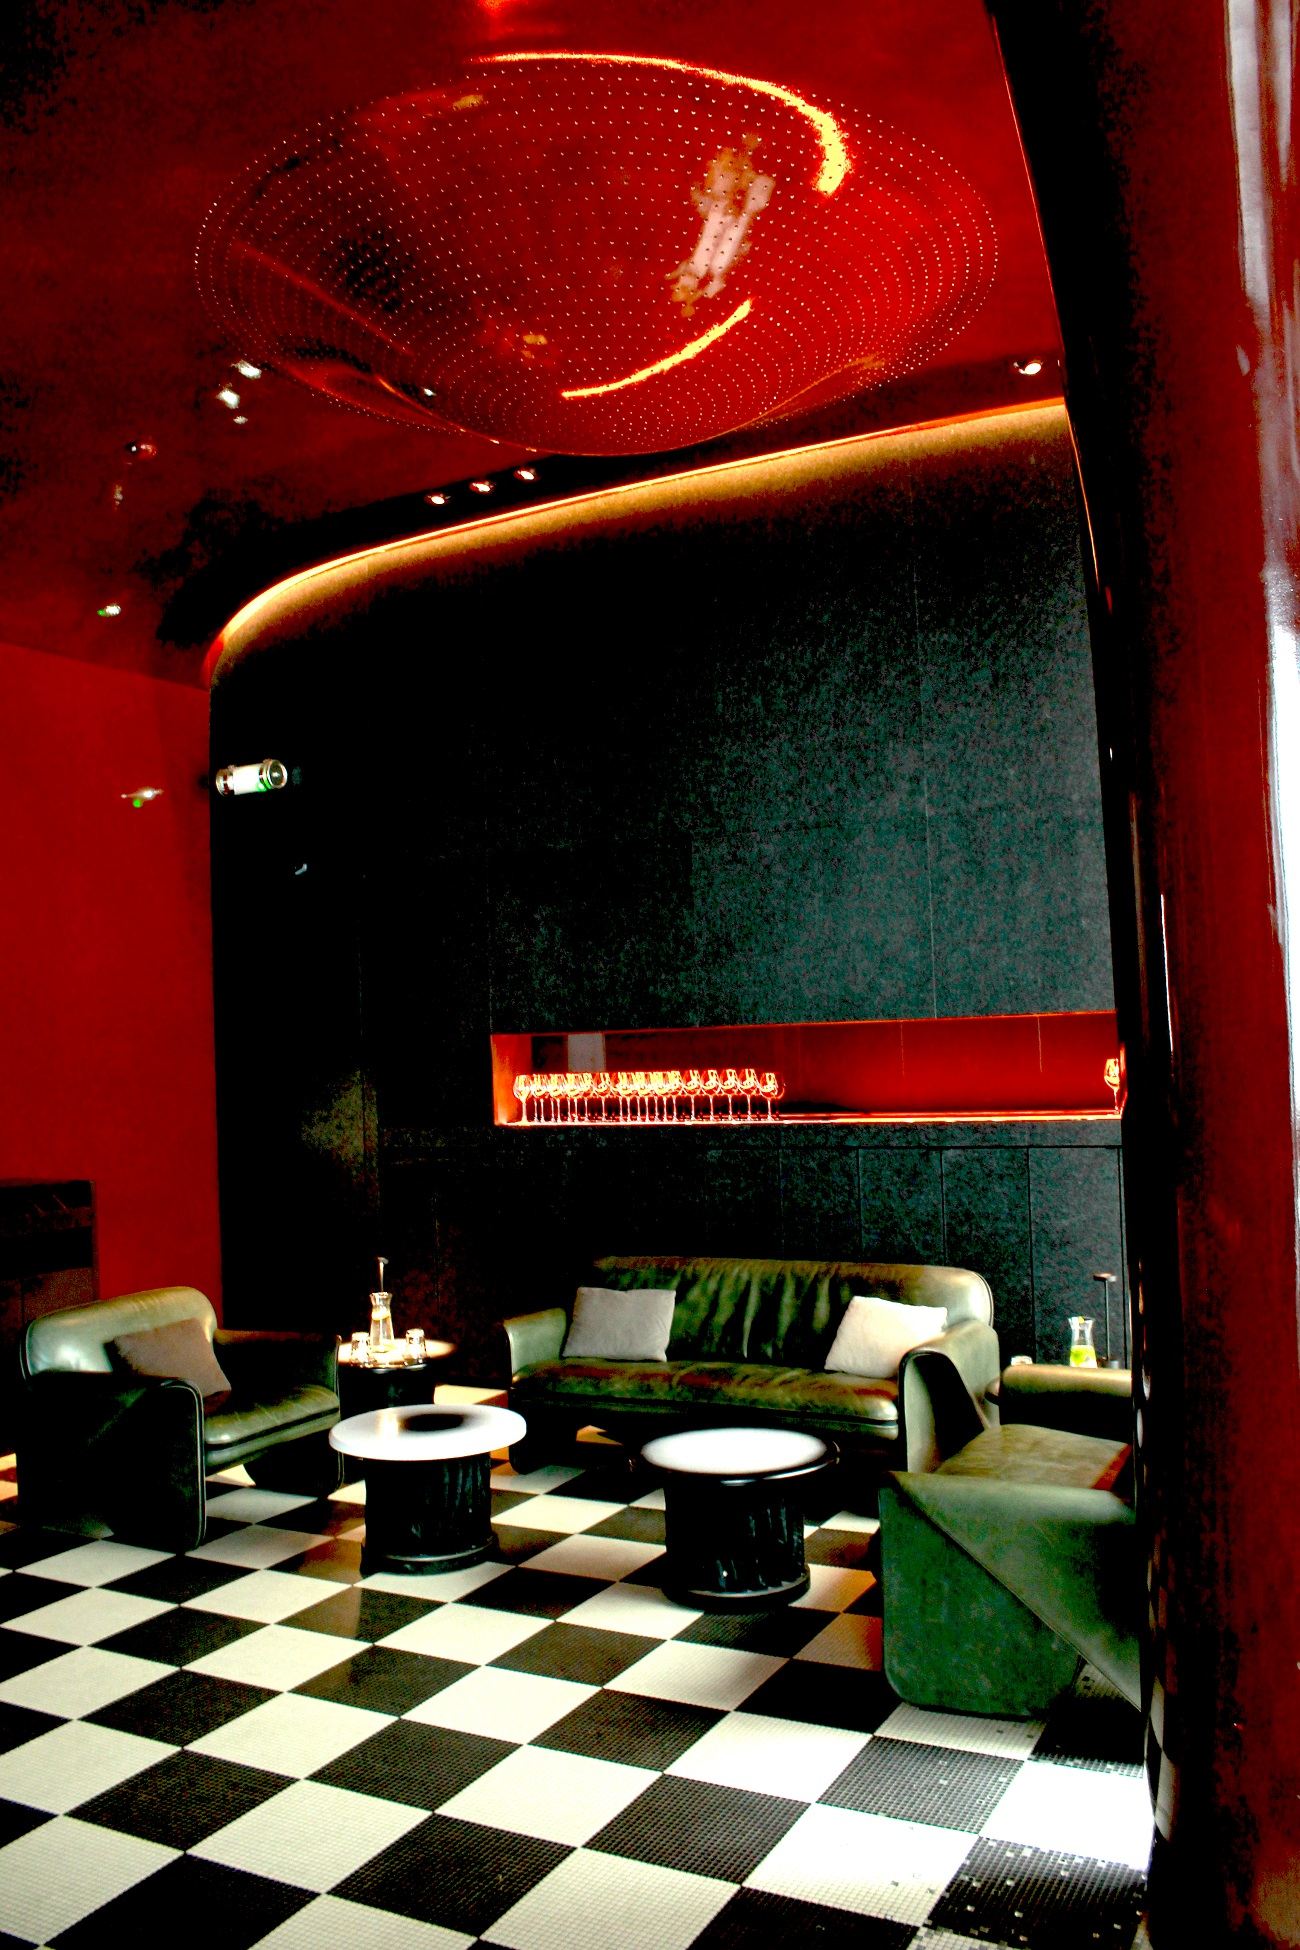 Les Bains Douches  Paris. Style by Vukota. Fashionela